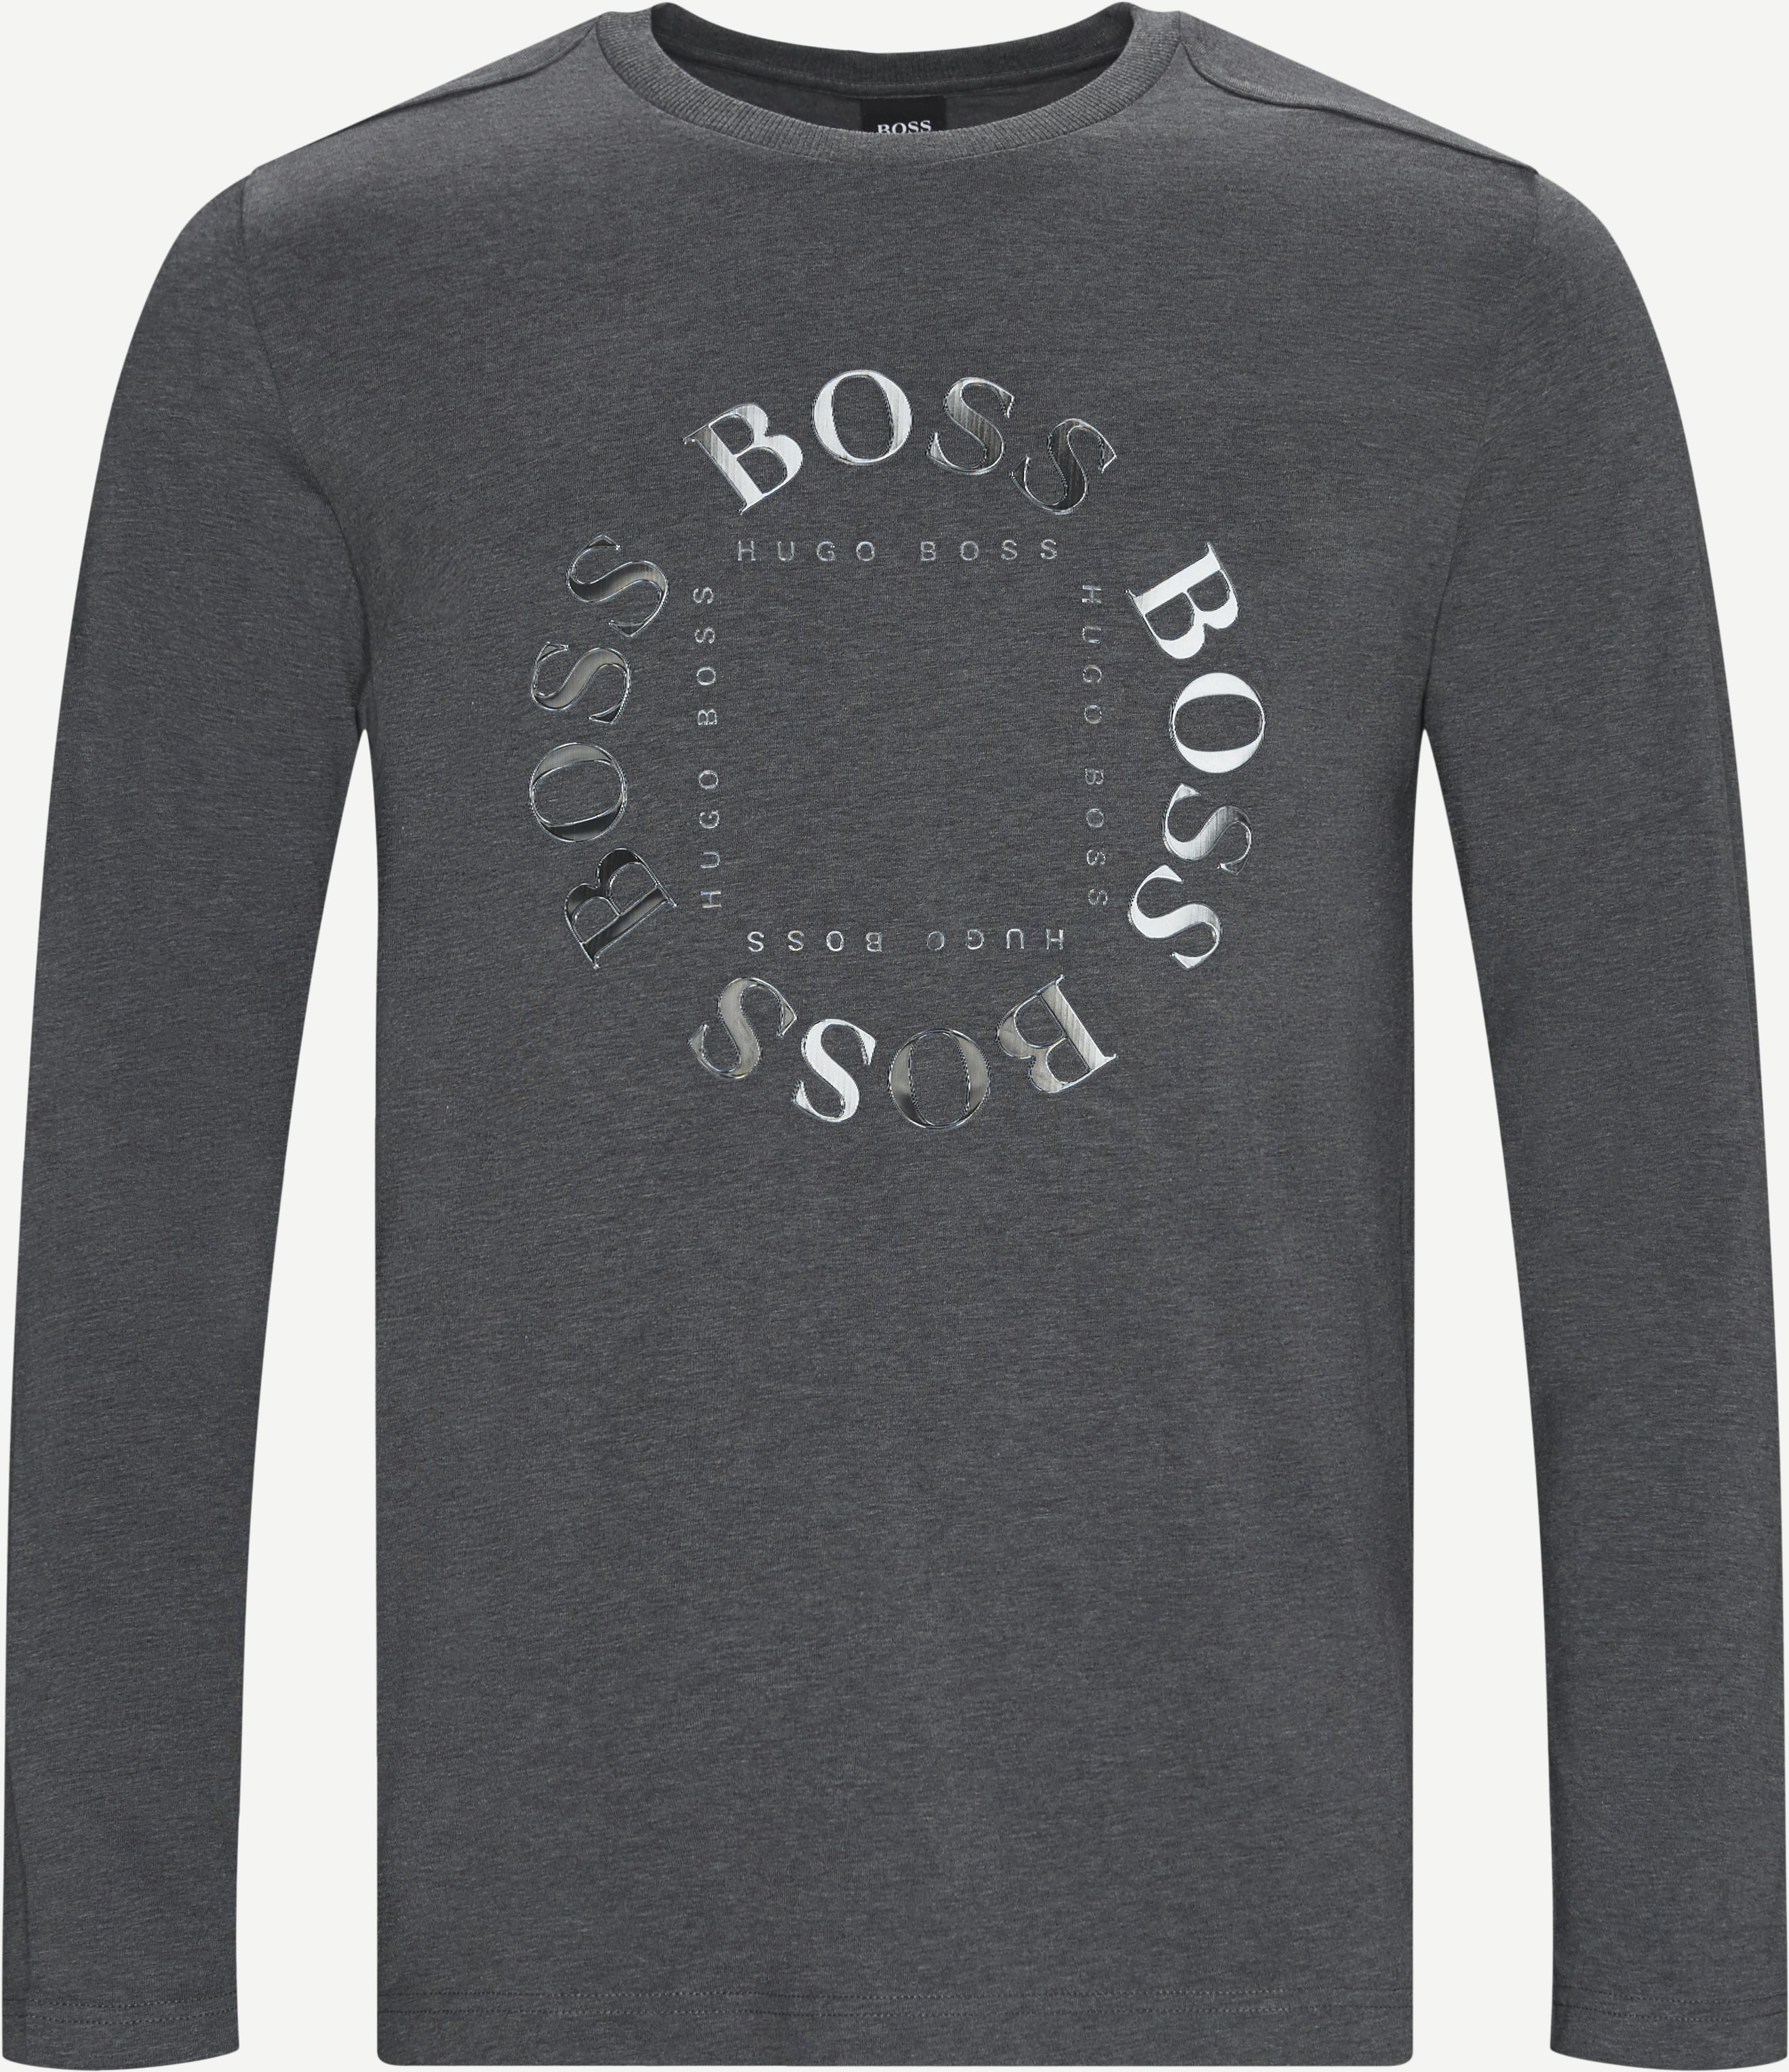 Togn 1 Langærmet T-shirt - T-shirts - Regular fit - Grå